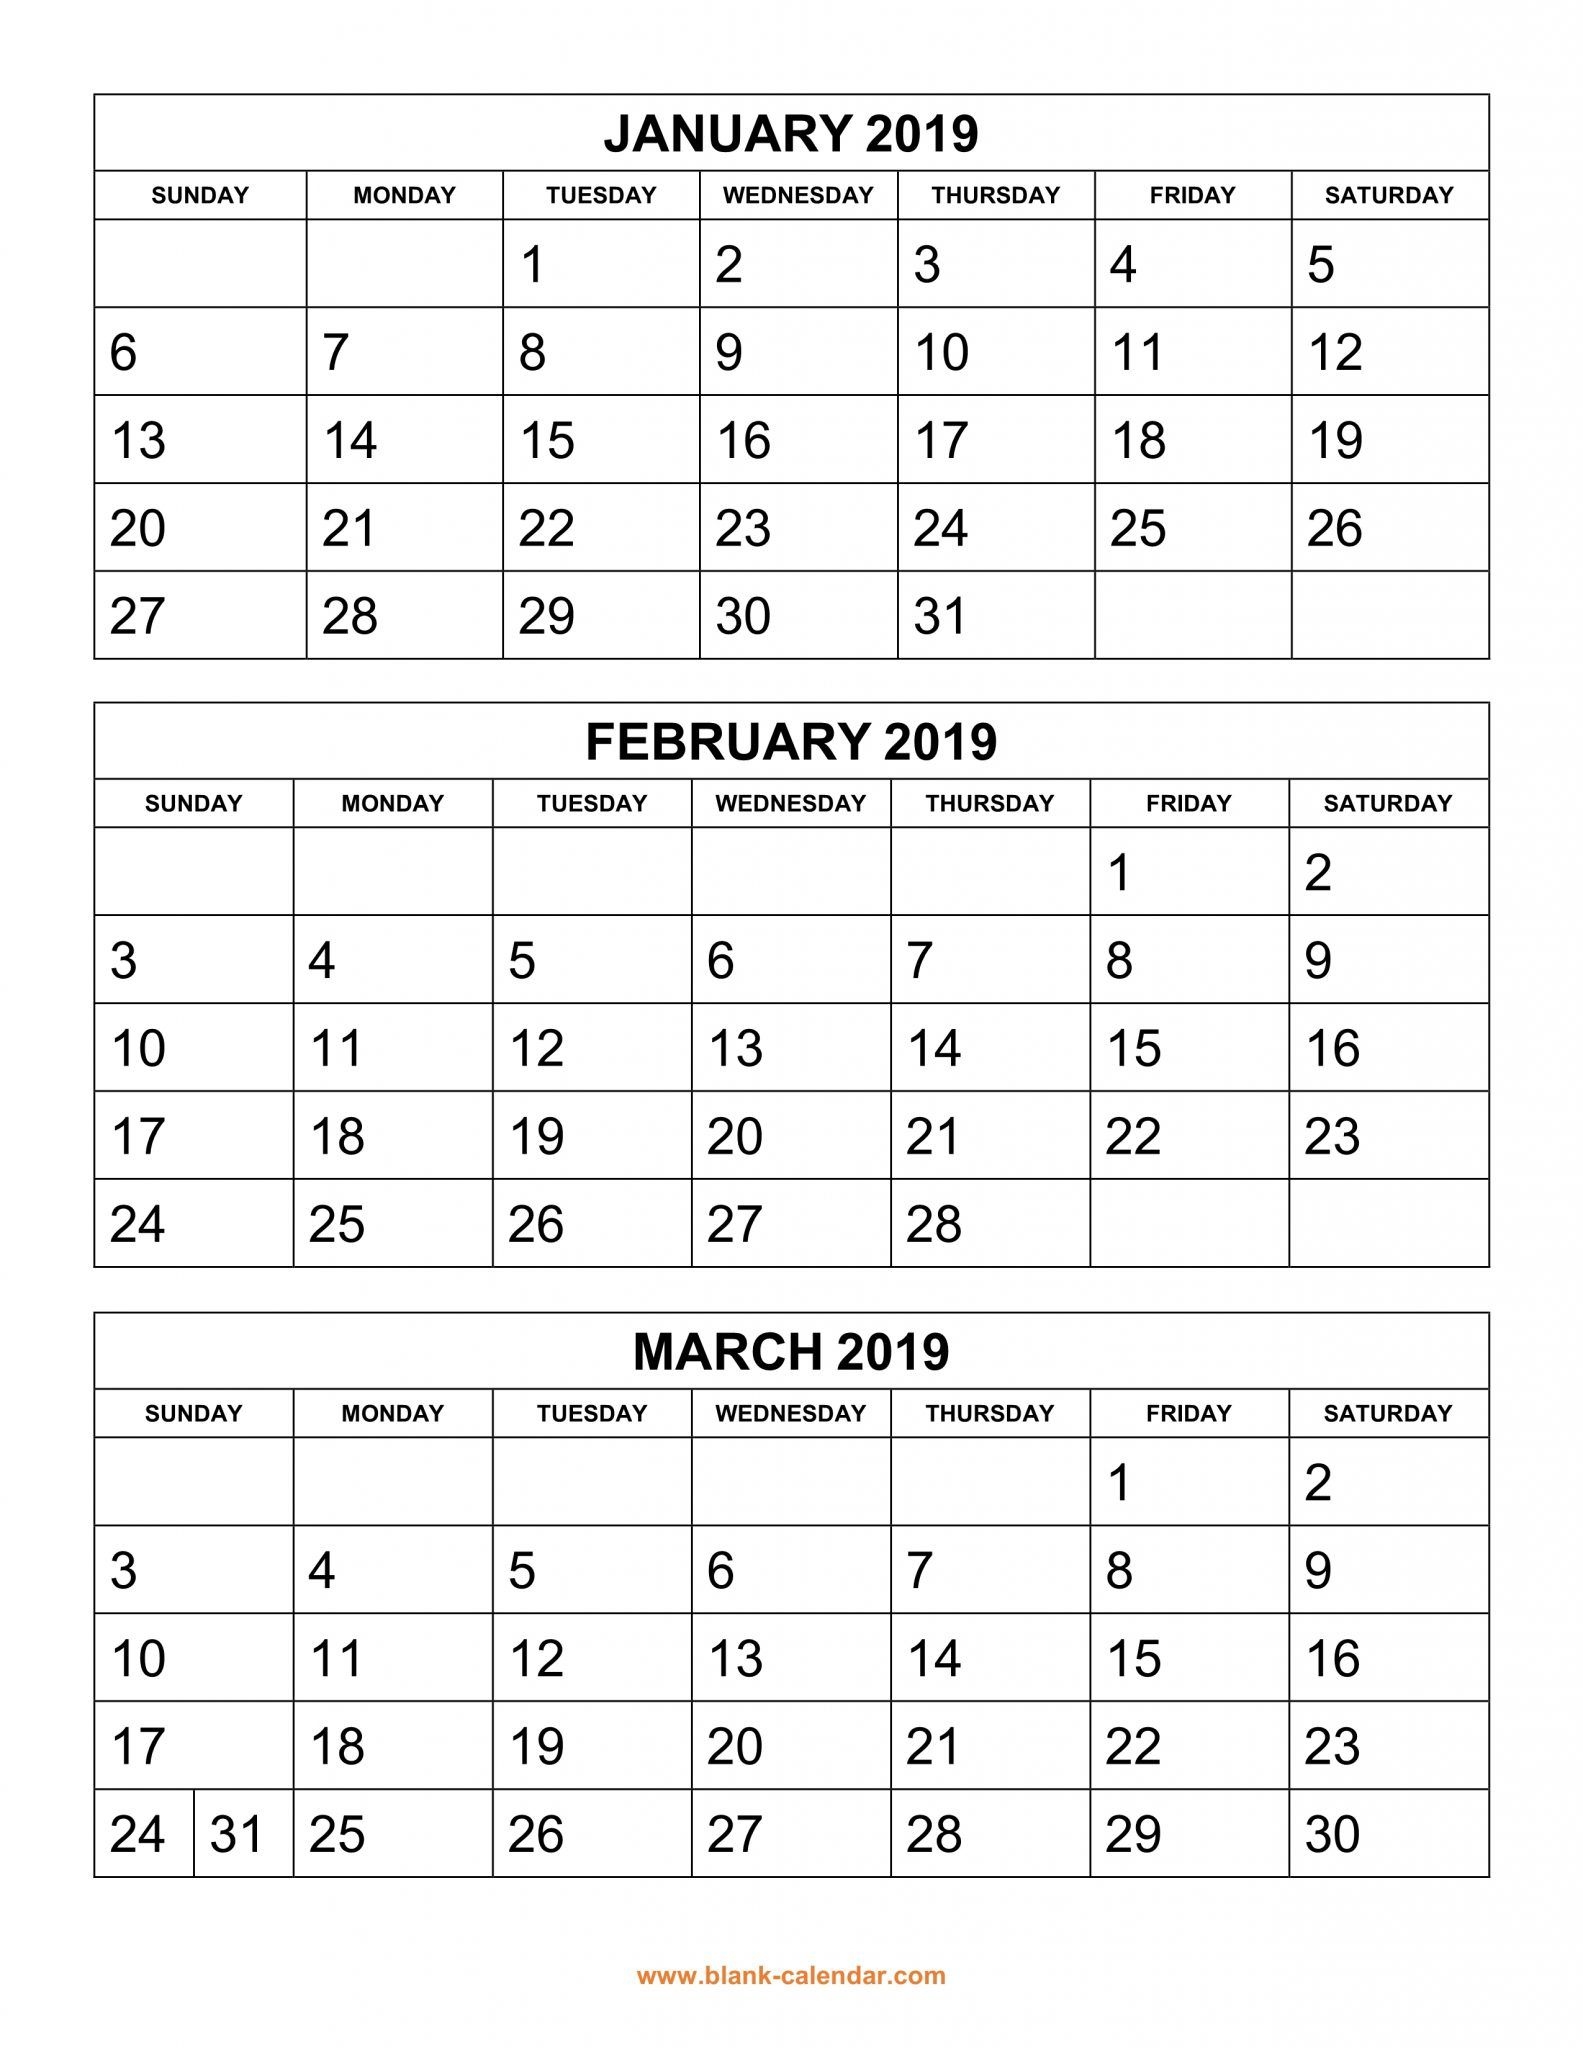 Get Free 2019 3 Month Calendar Templates Printable